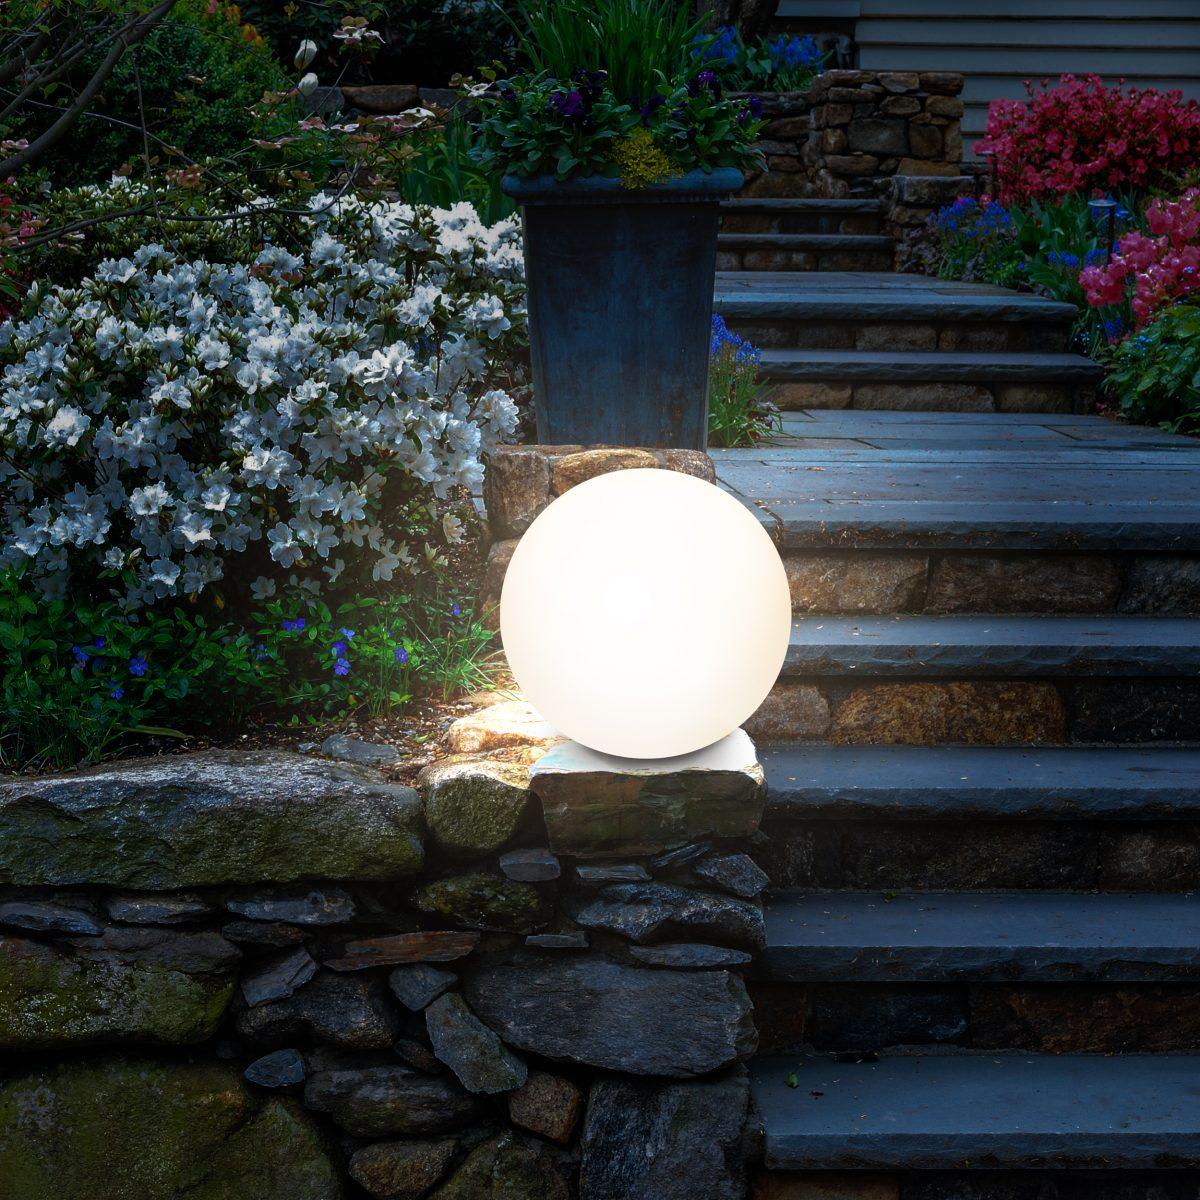 LED Solar Leuchtkugel neben der Treppe